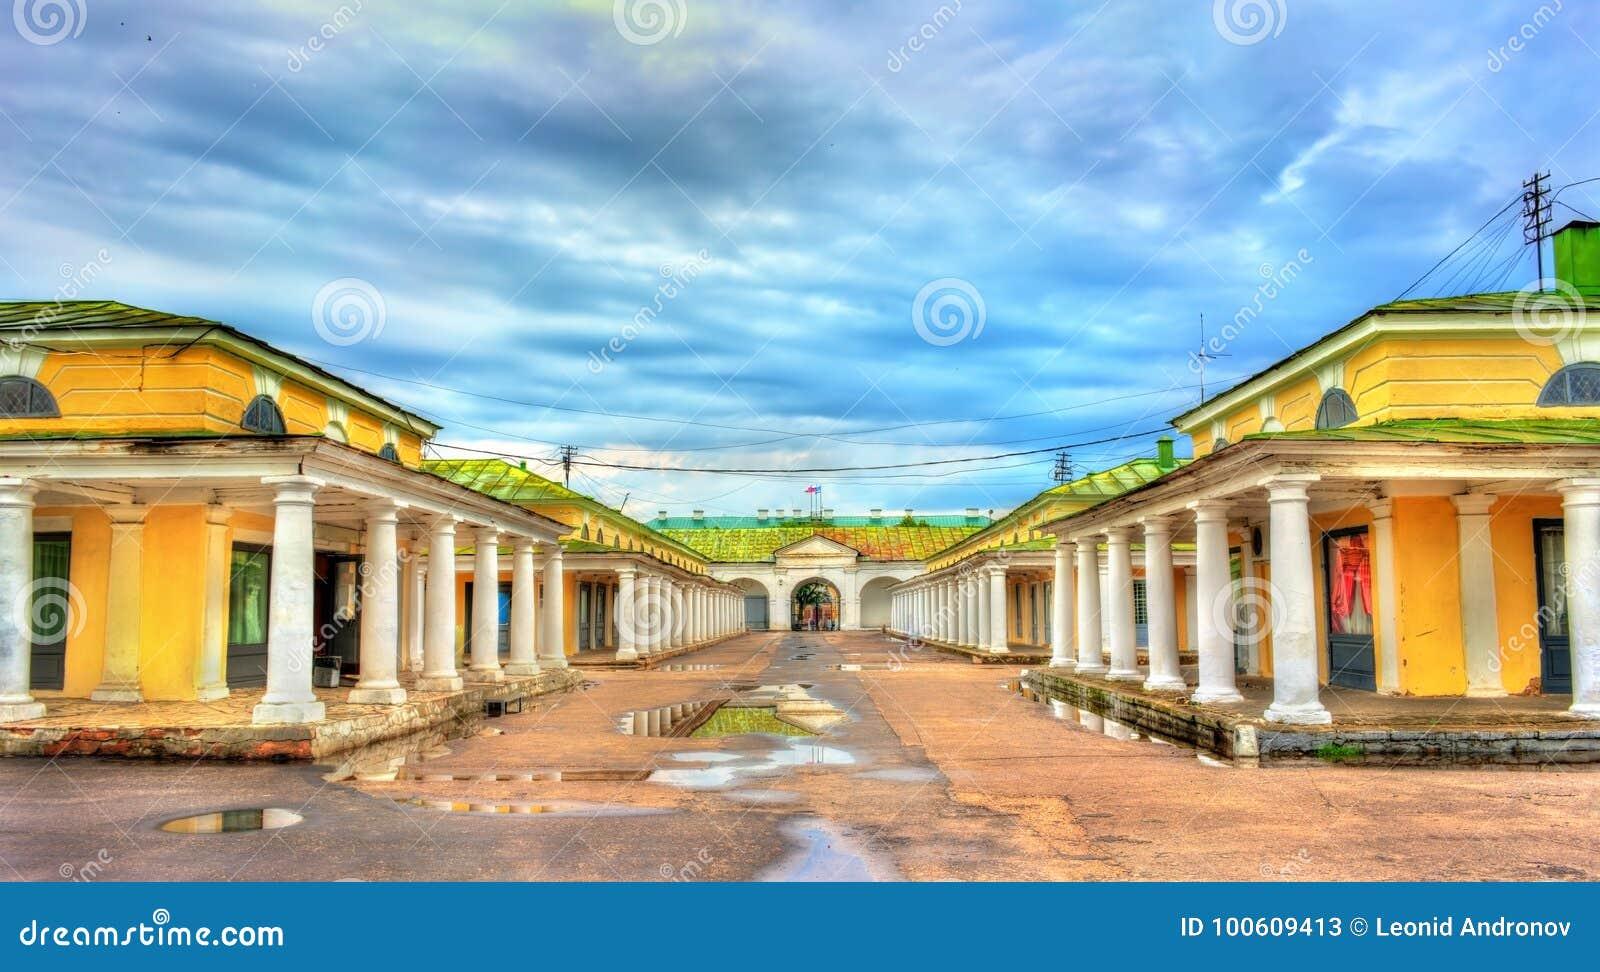 Gostiny Dvor, provinsiella Neoclassical handelgallerier i Kostroma, Ryssland